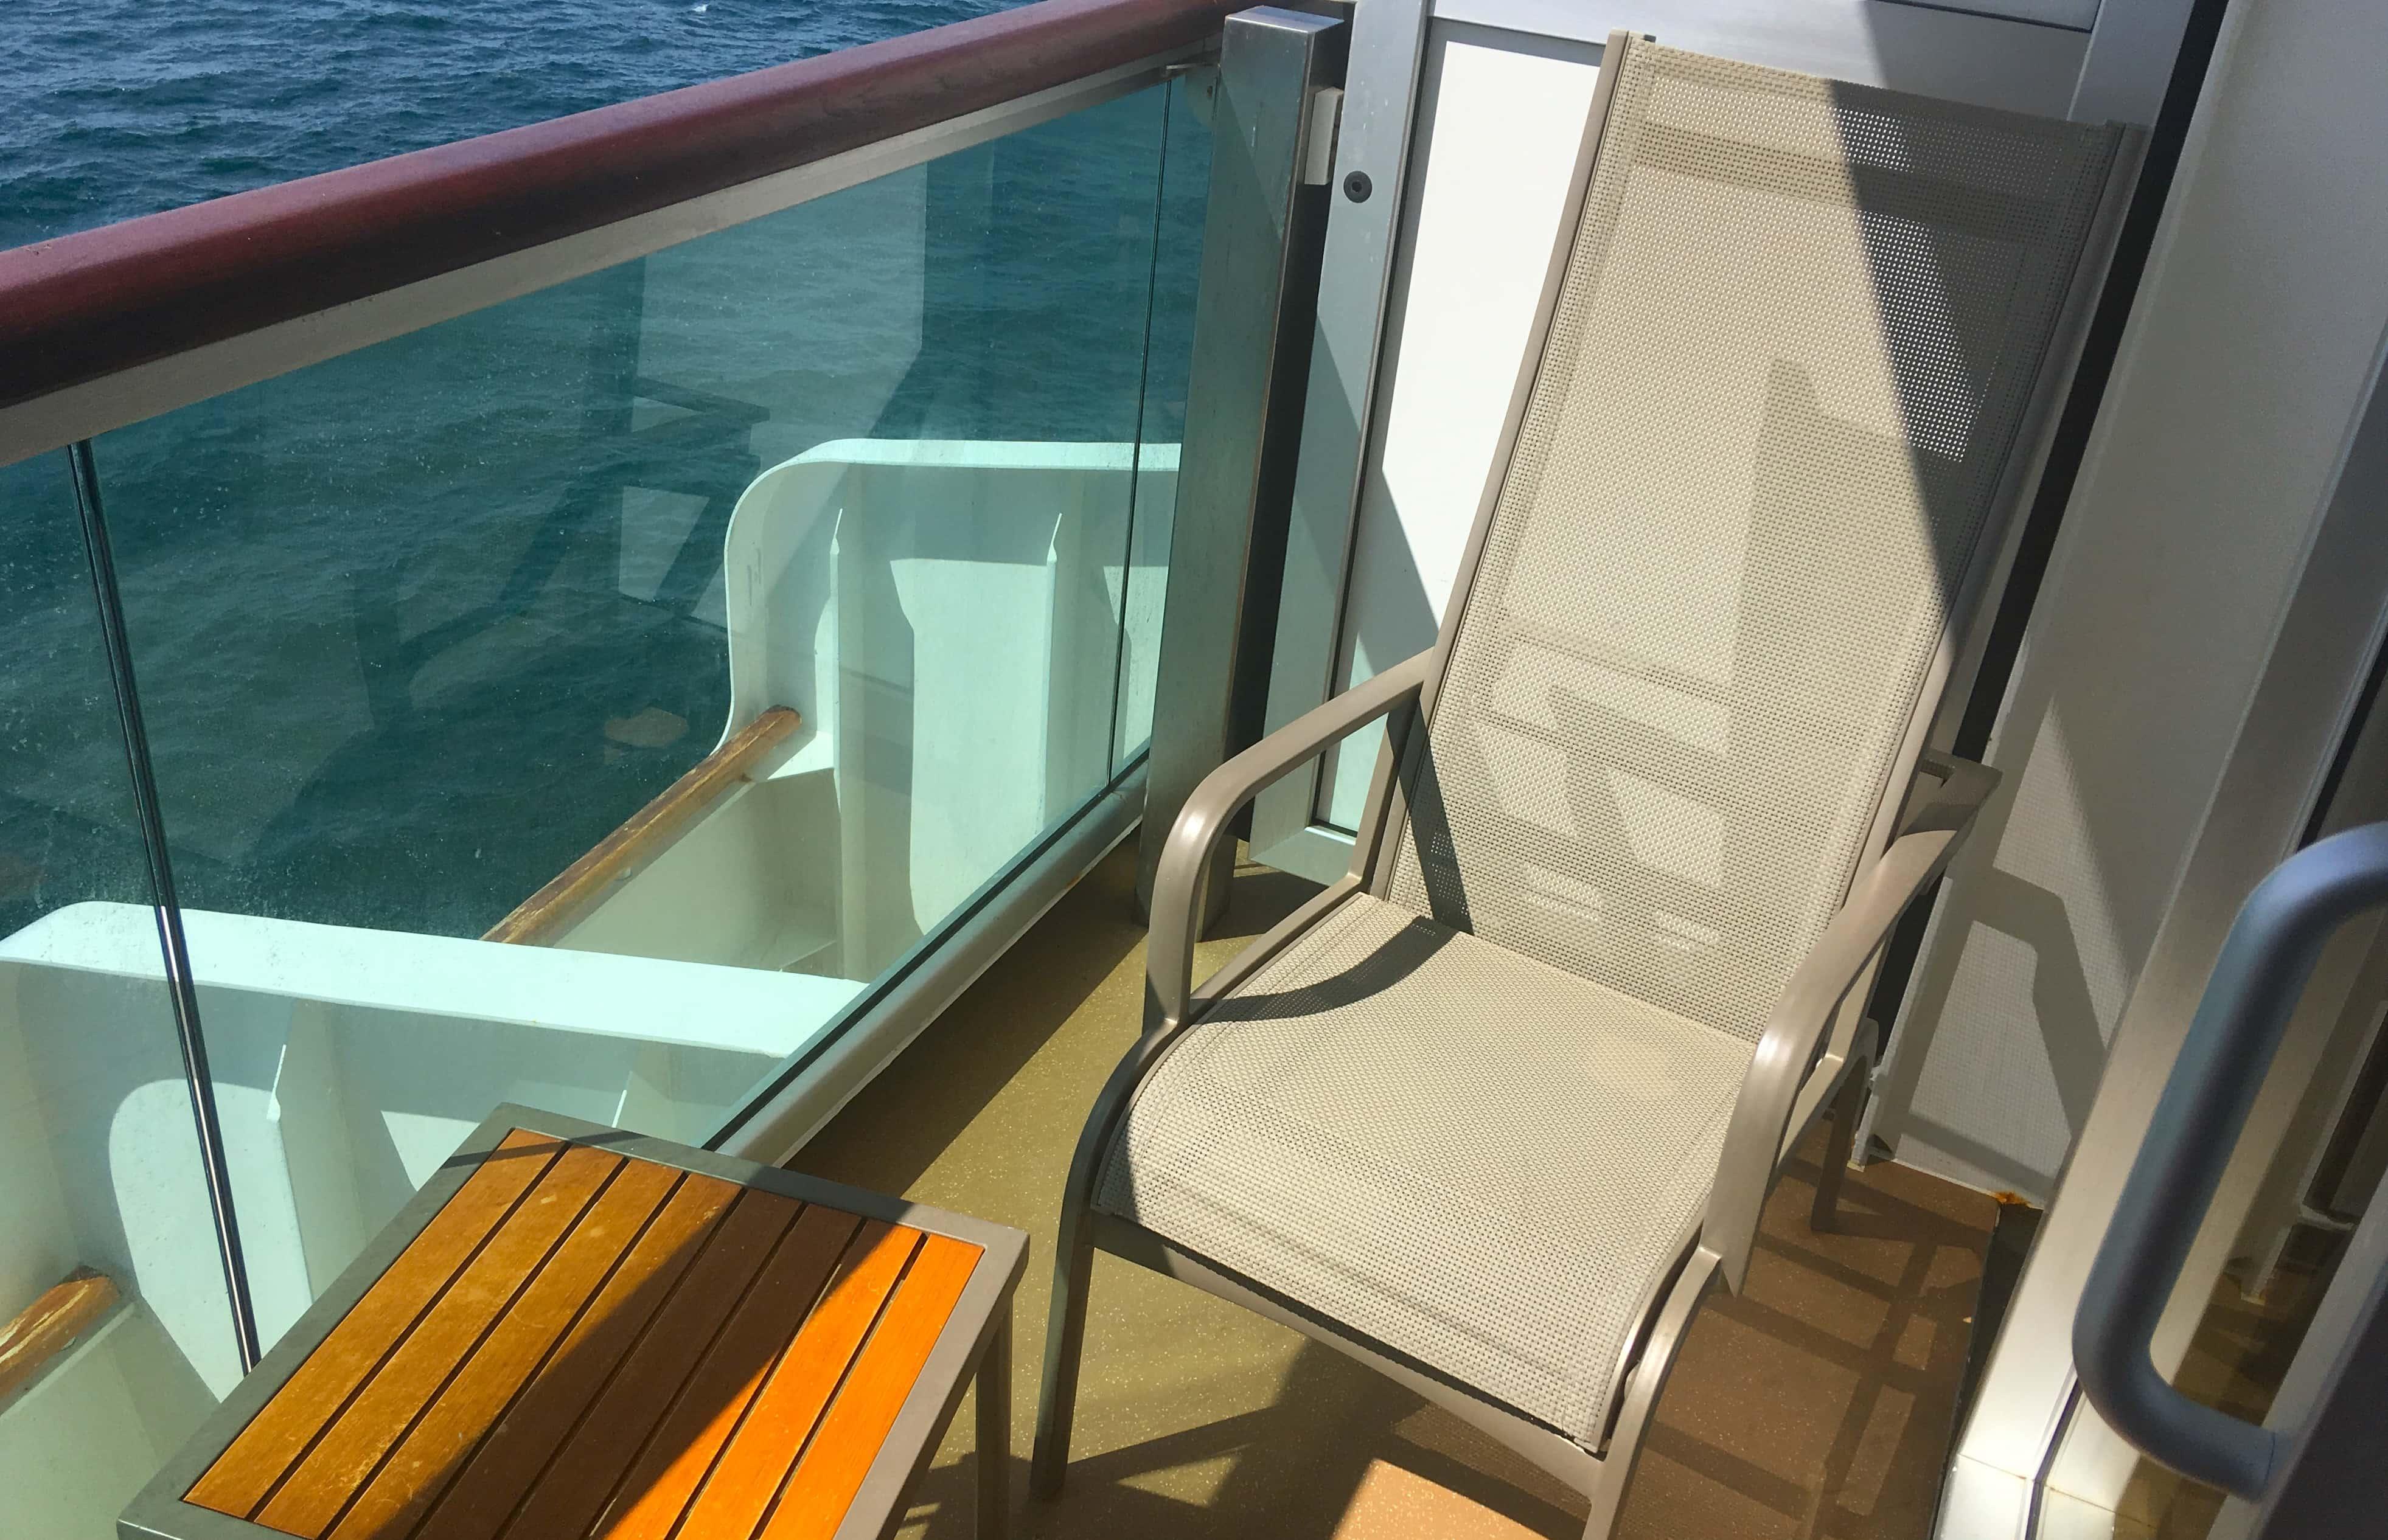 p&o britannia balcony size small big review reviews sun on balcony chair